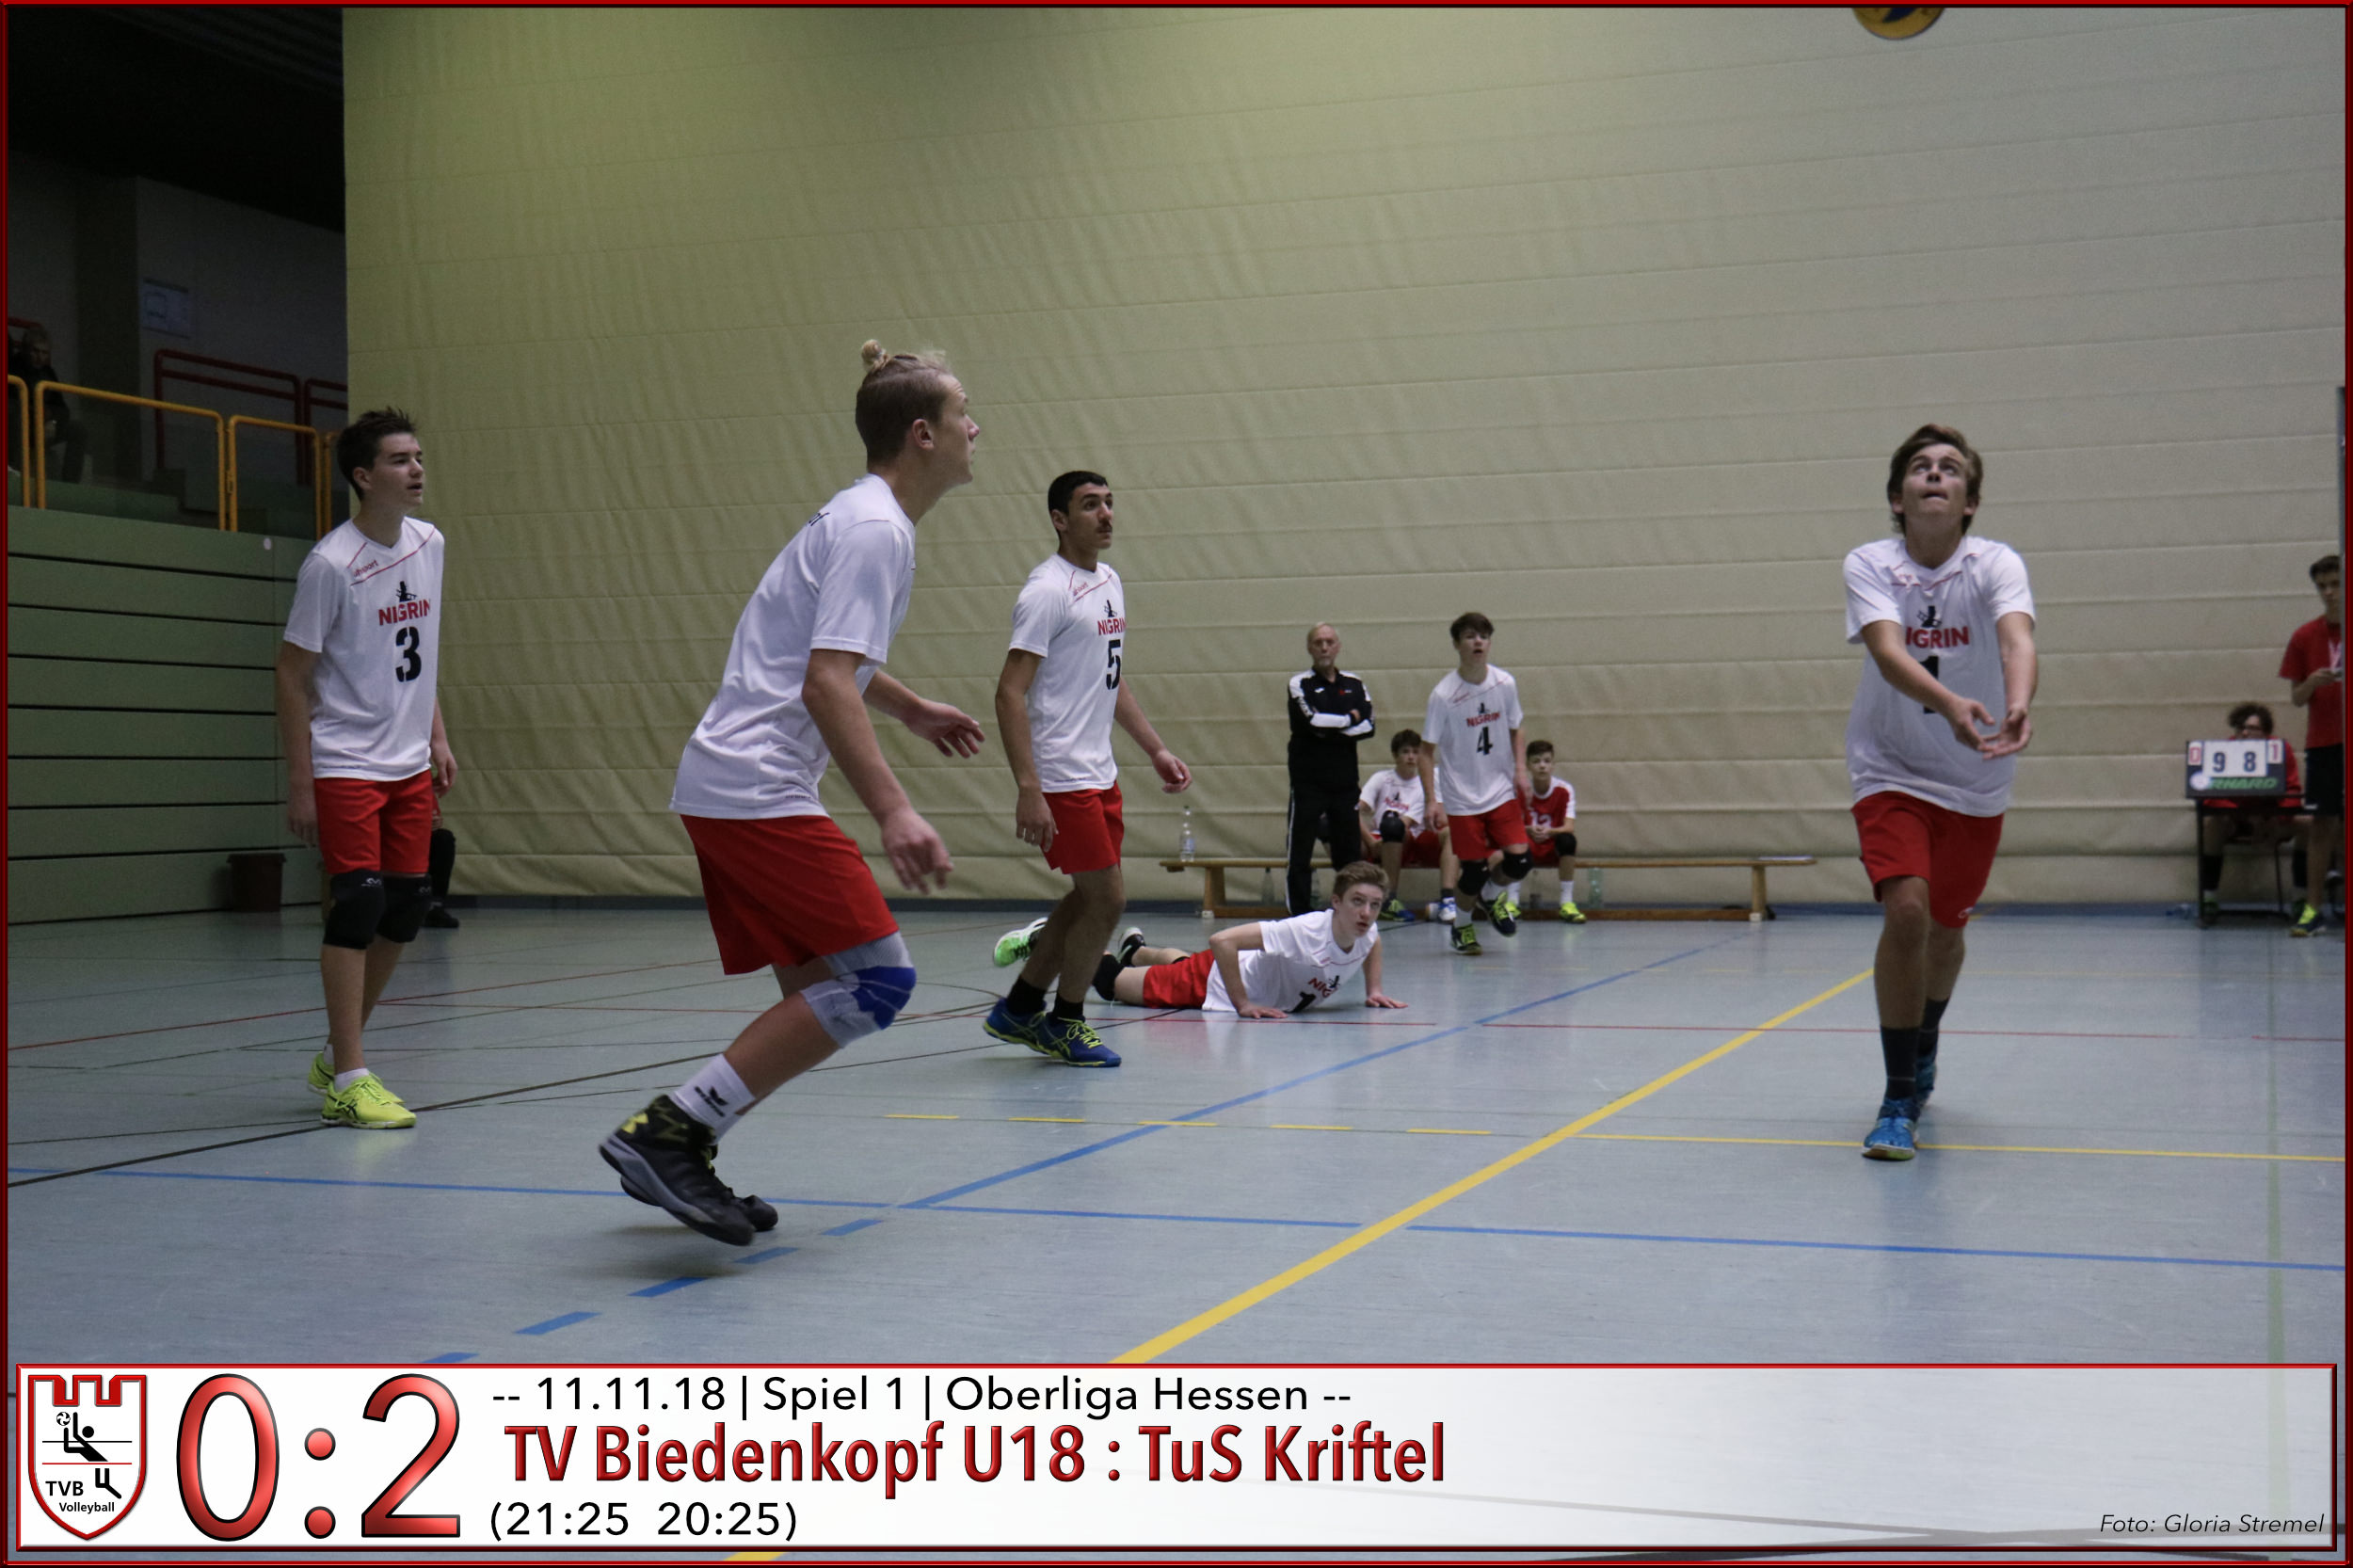 U18m | Heimspiel gegen TuS Kriftel am 11.11.2018